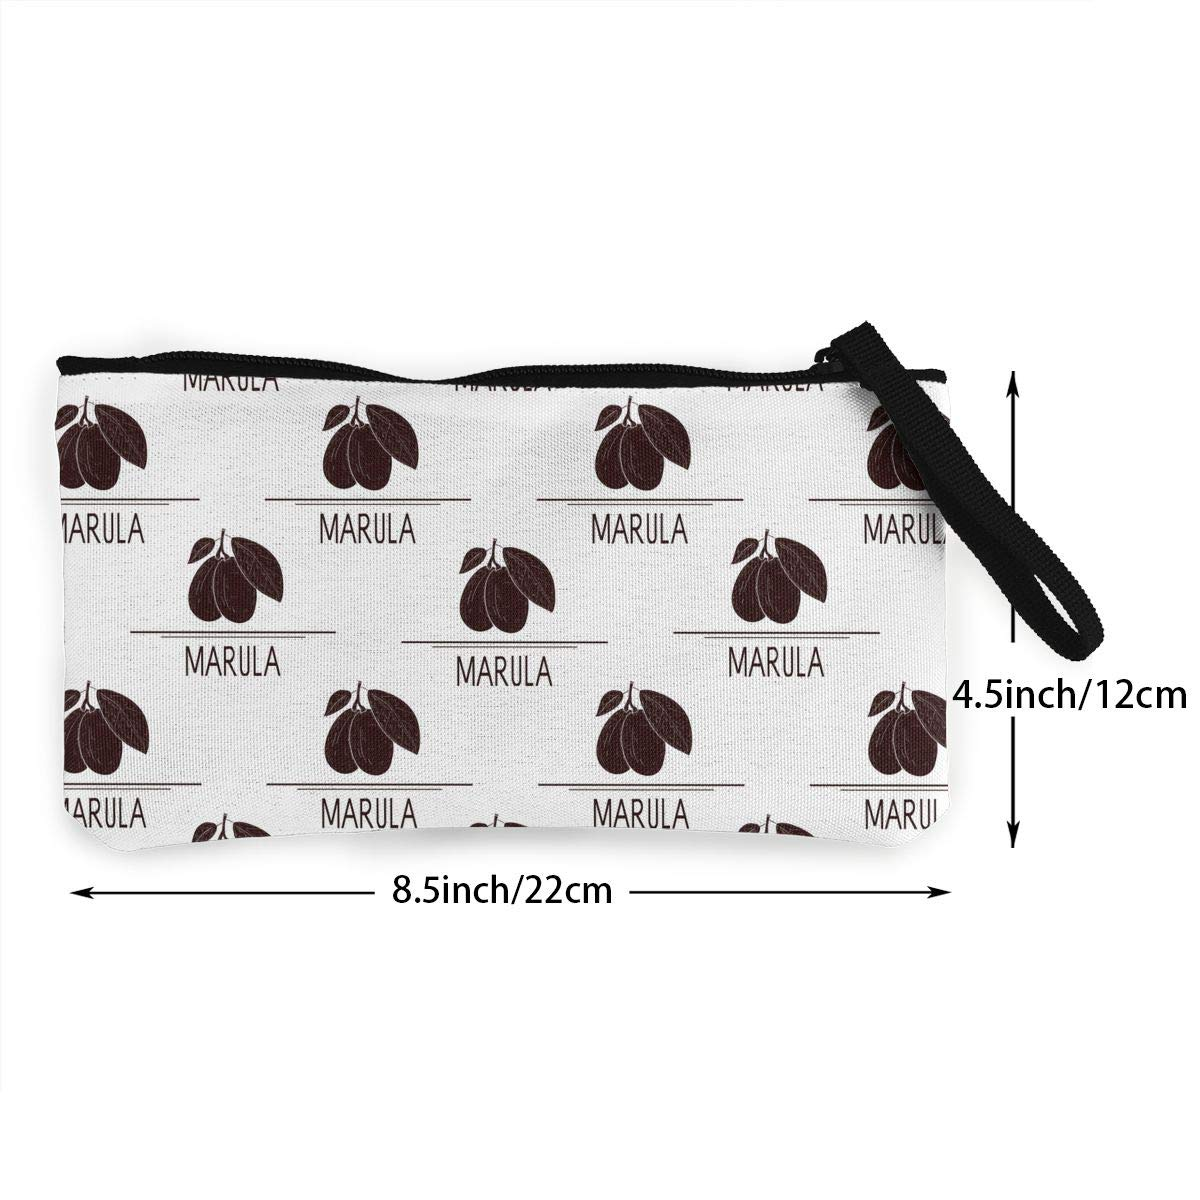 Womens Canvas Coin Wallet Cellphone Clutch Purse With Wrist Strap Marula Fruit Pattern Zipper Small Purse Wallets